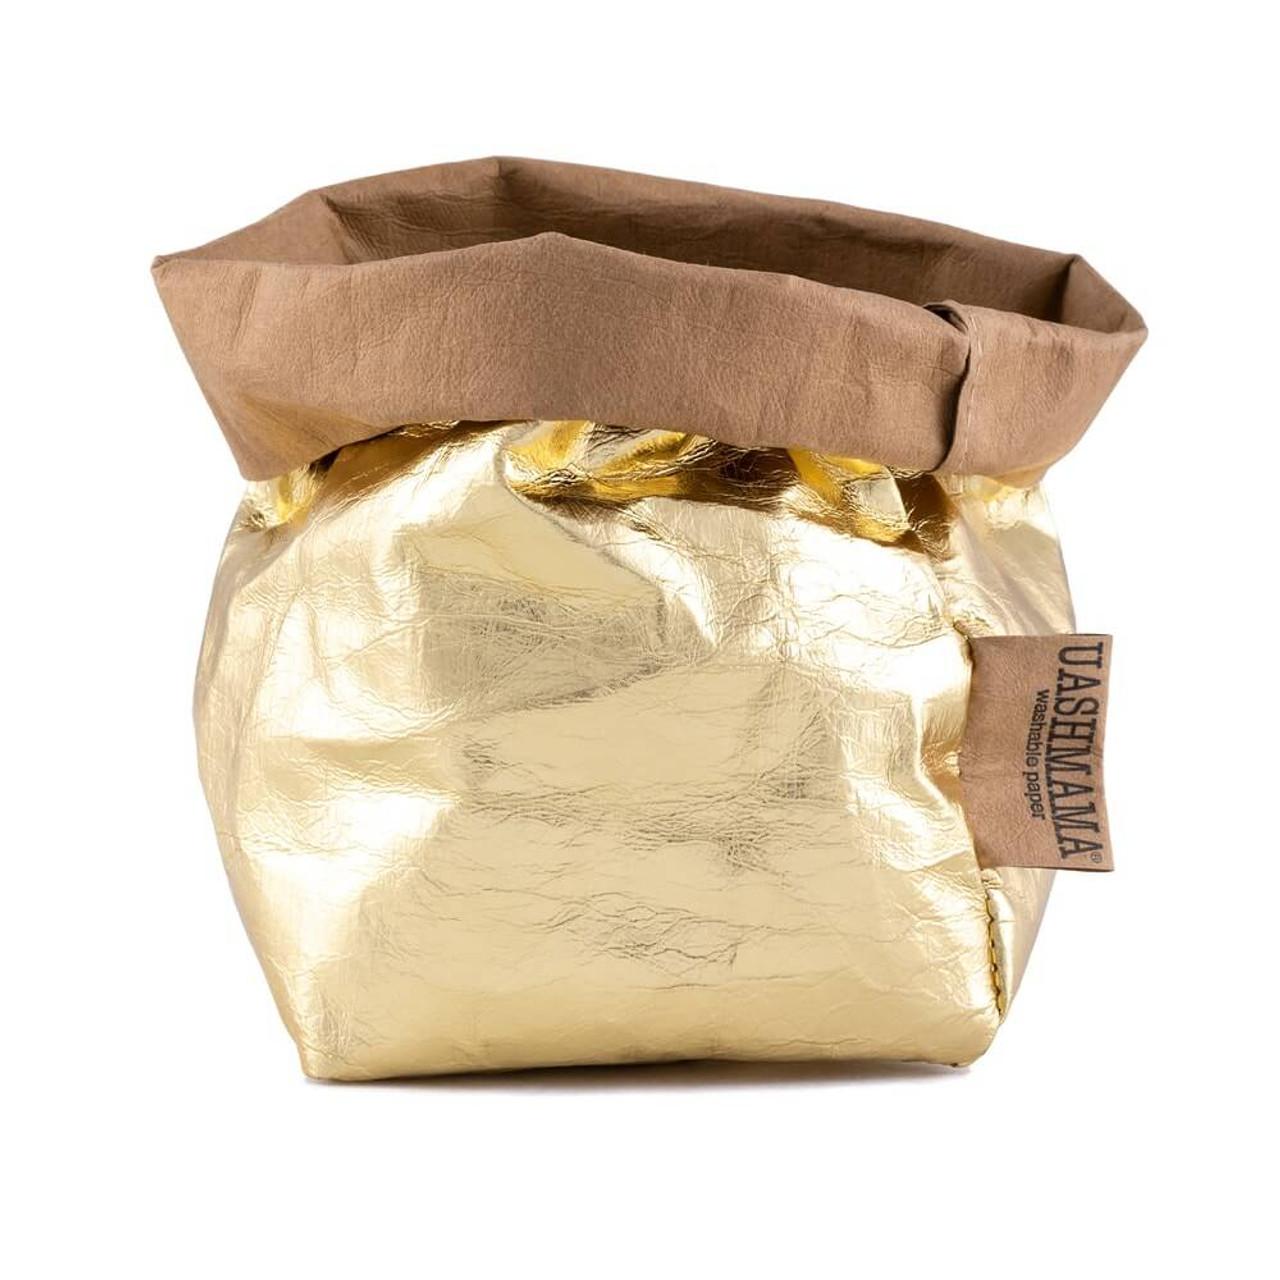 UASHMAMA small organic paper bags metallo